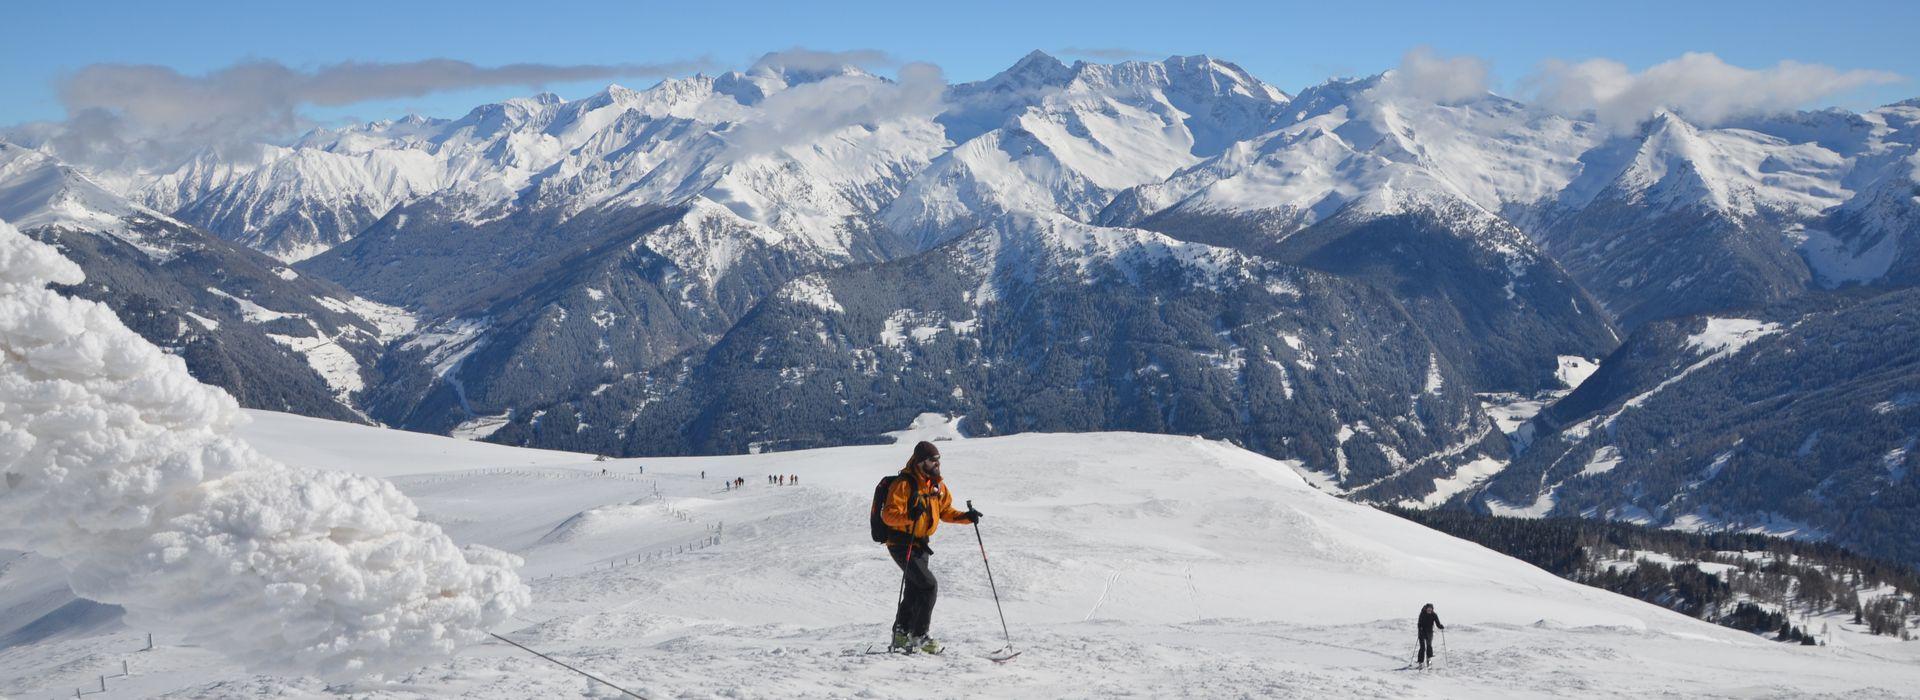 Eggerberg-Steinach / Skifahren im Wipptal